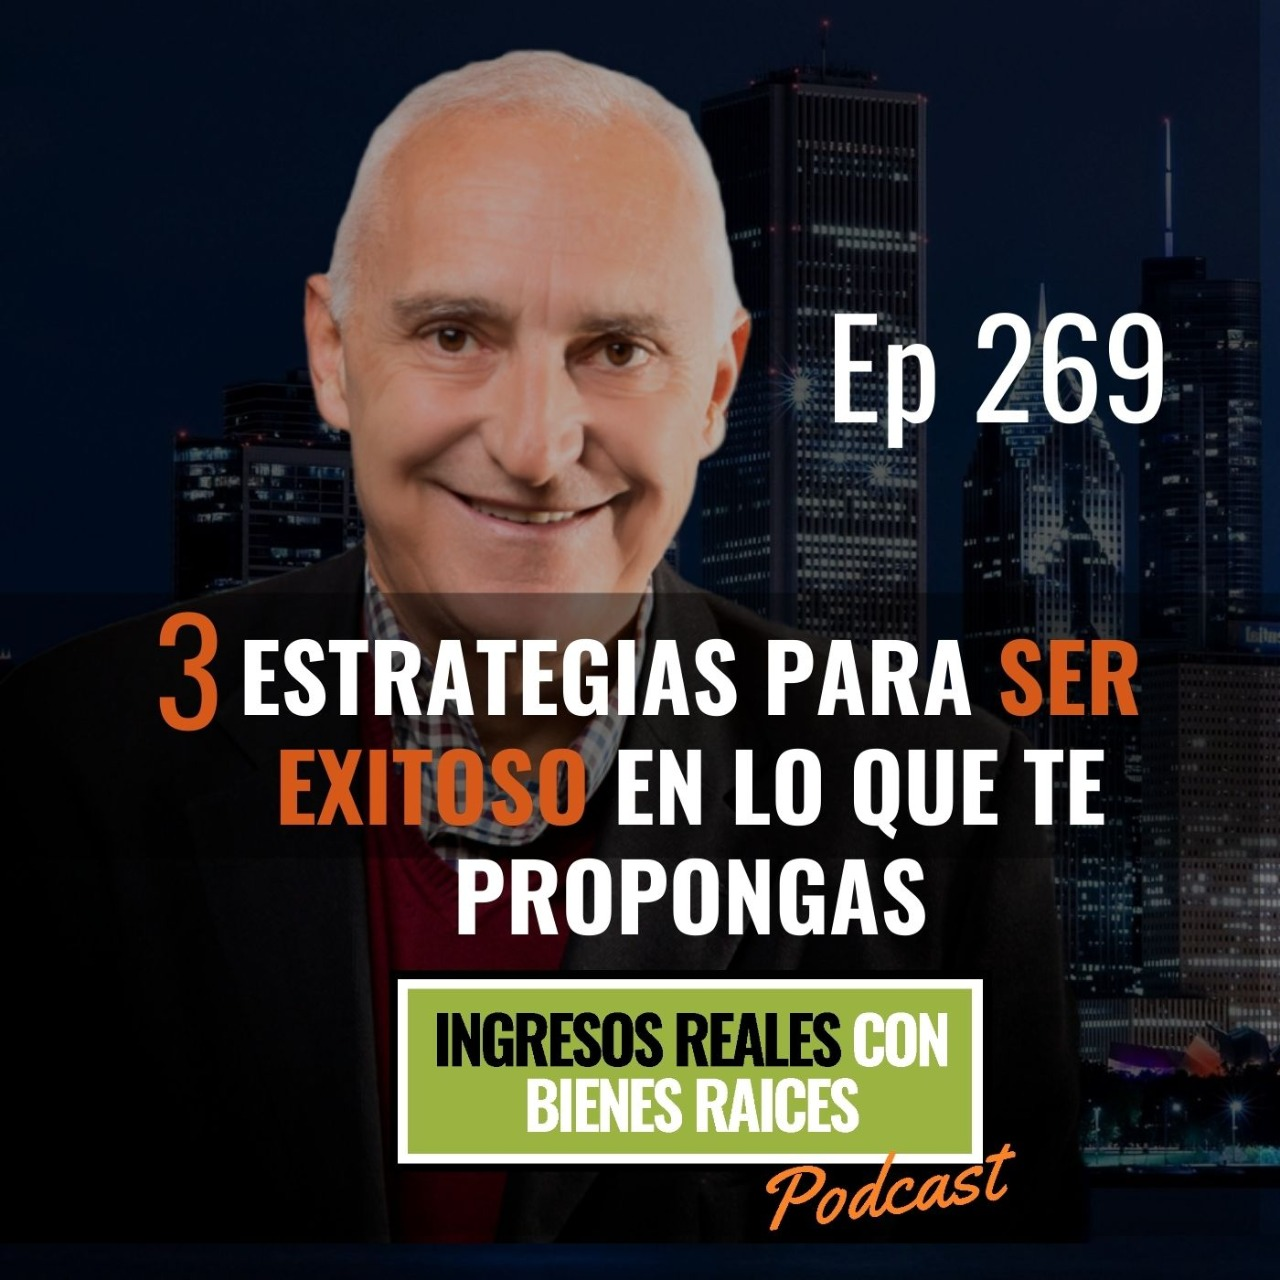 E269- 3 Estrategias para Ser Exitoso en lo que te Propongas